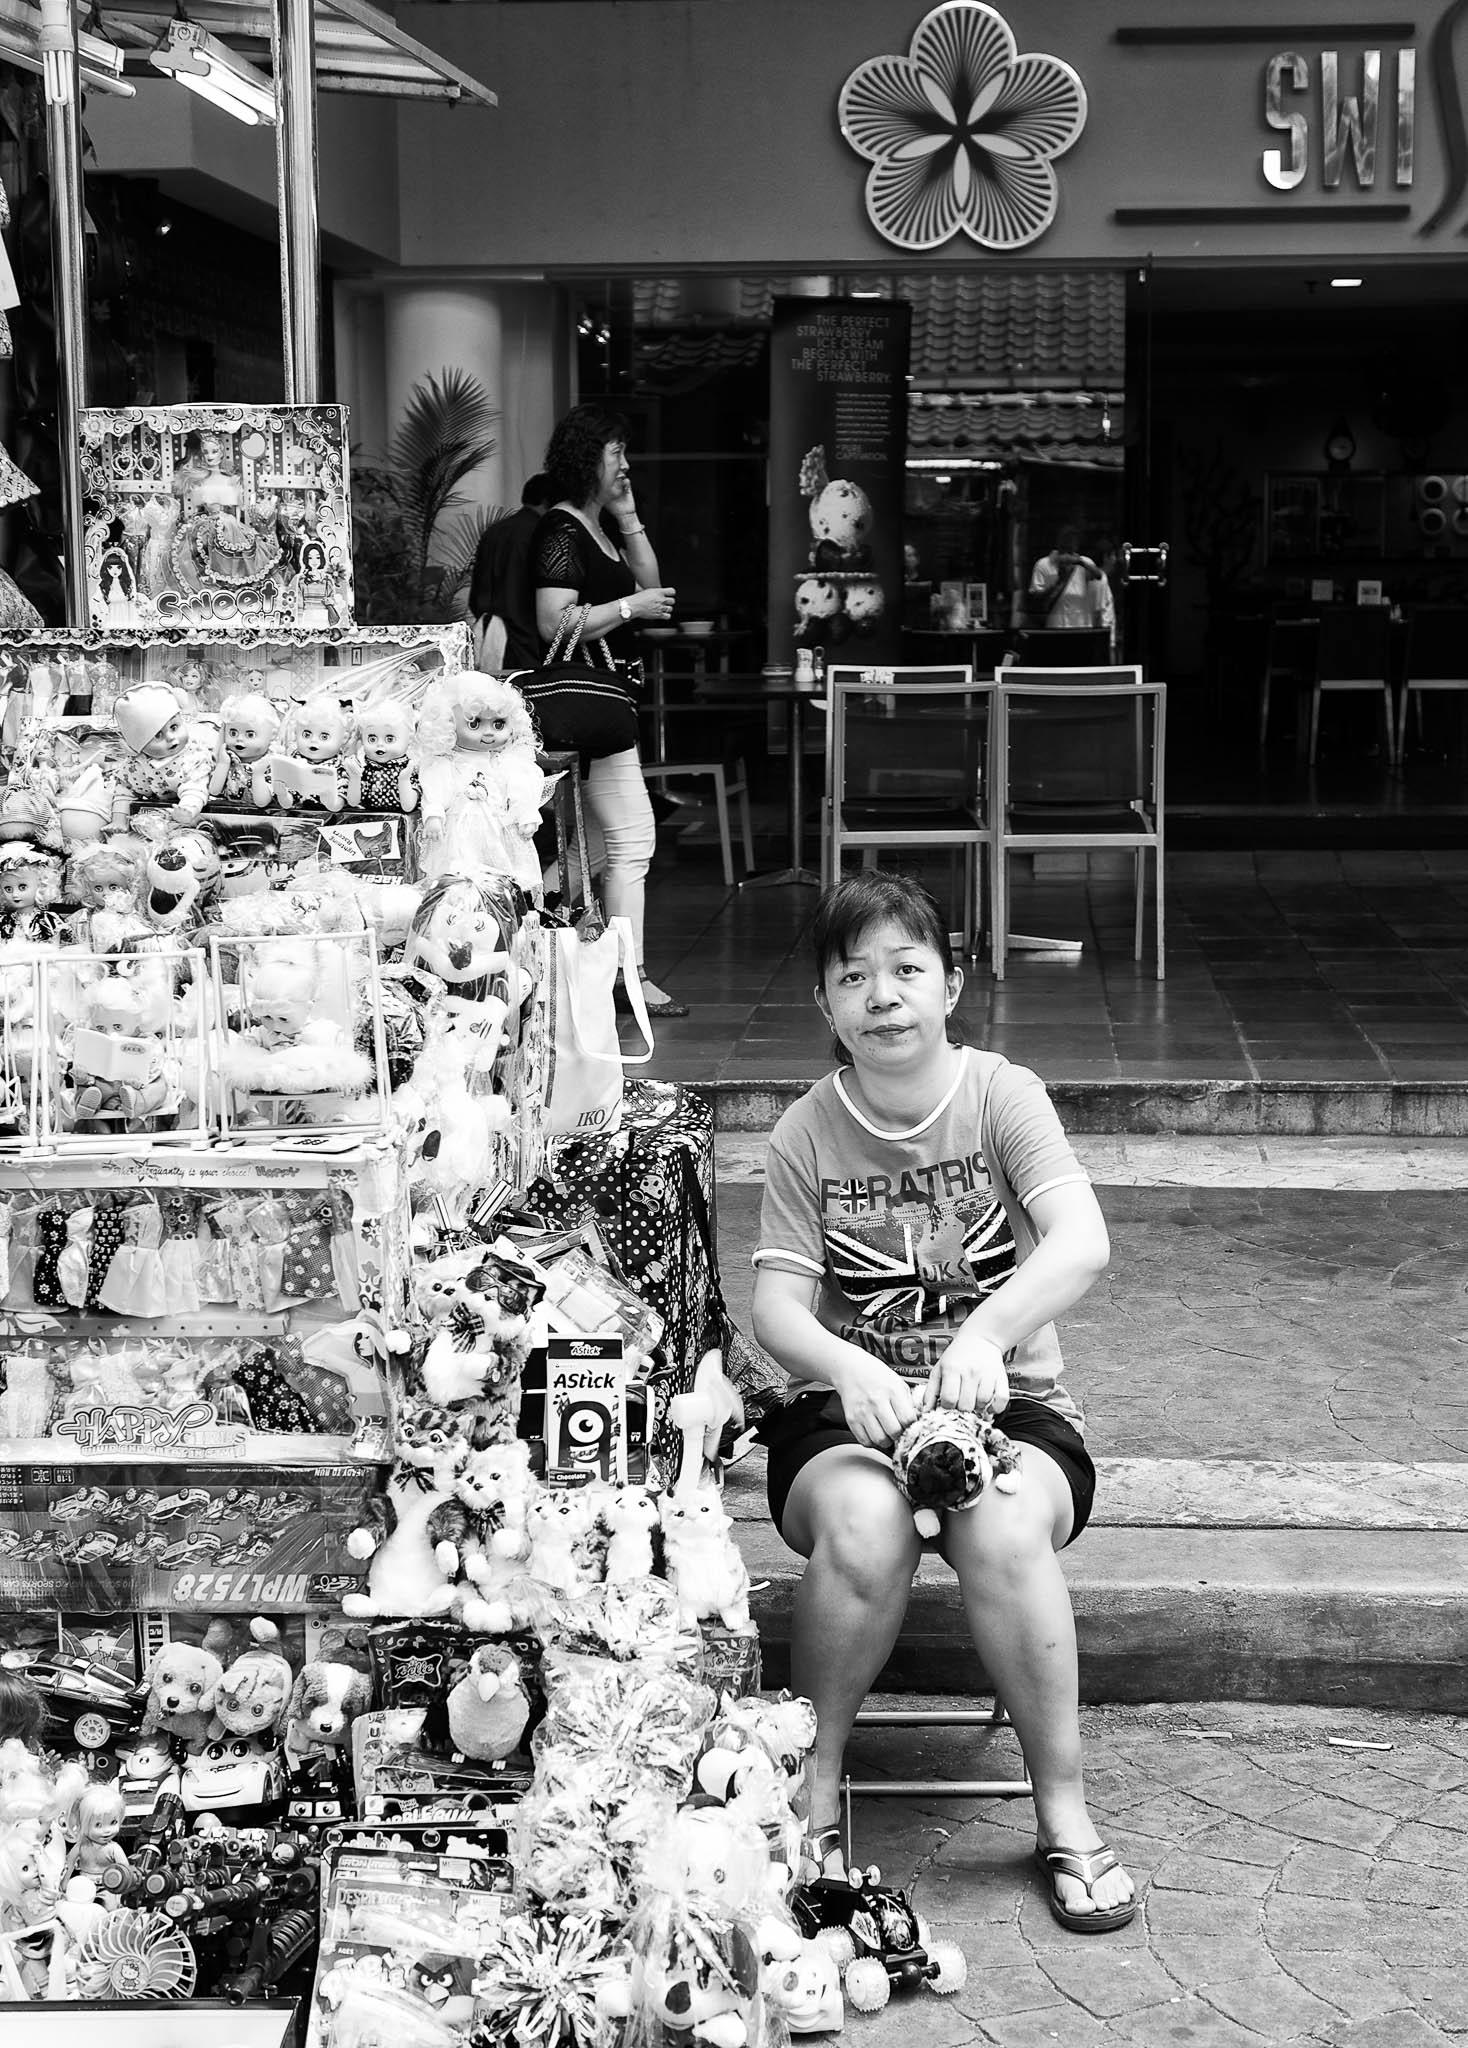 A toy shop keeper at Petaling Street, Kuala Lumpur, Malaysia